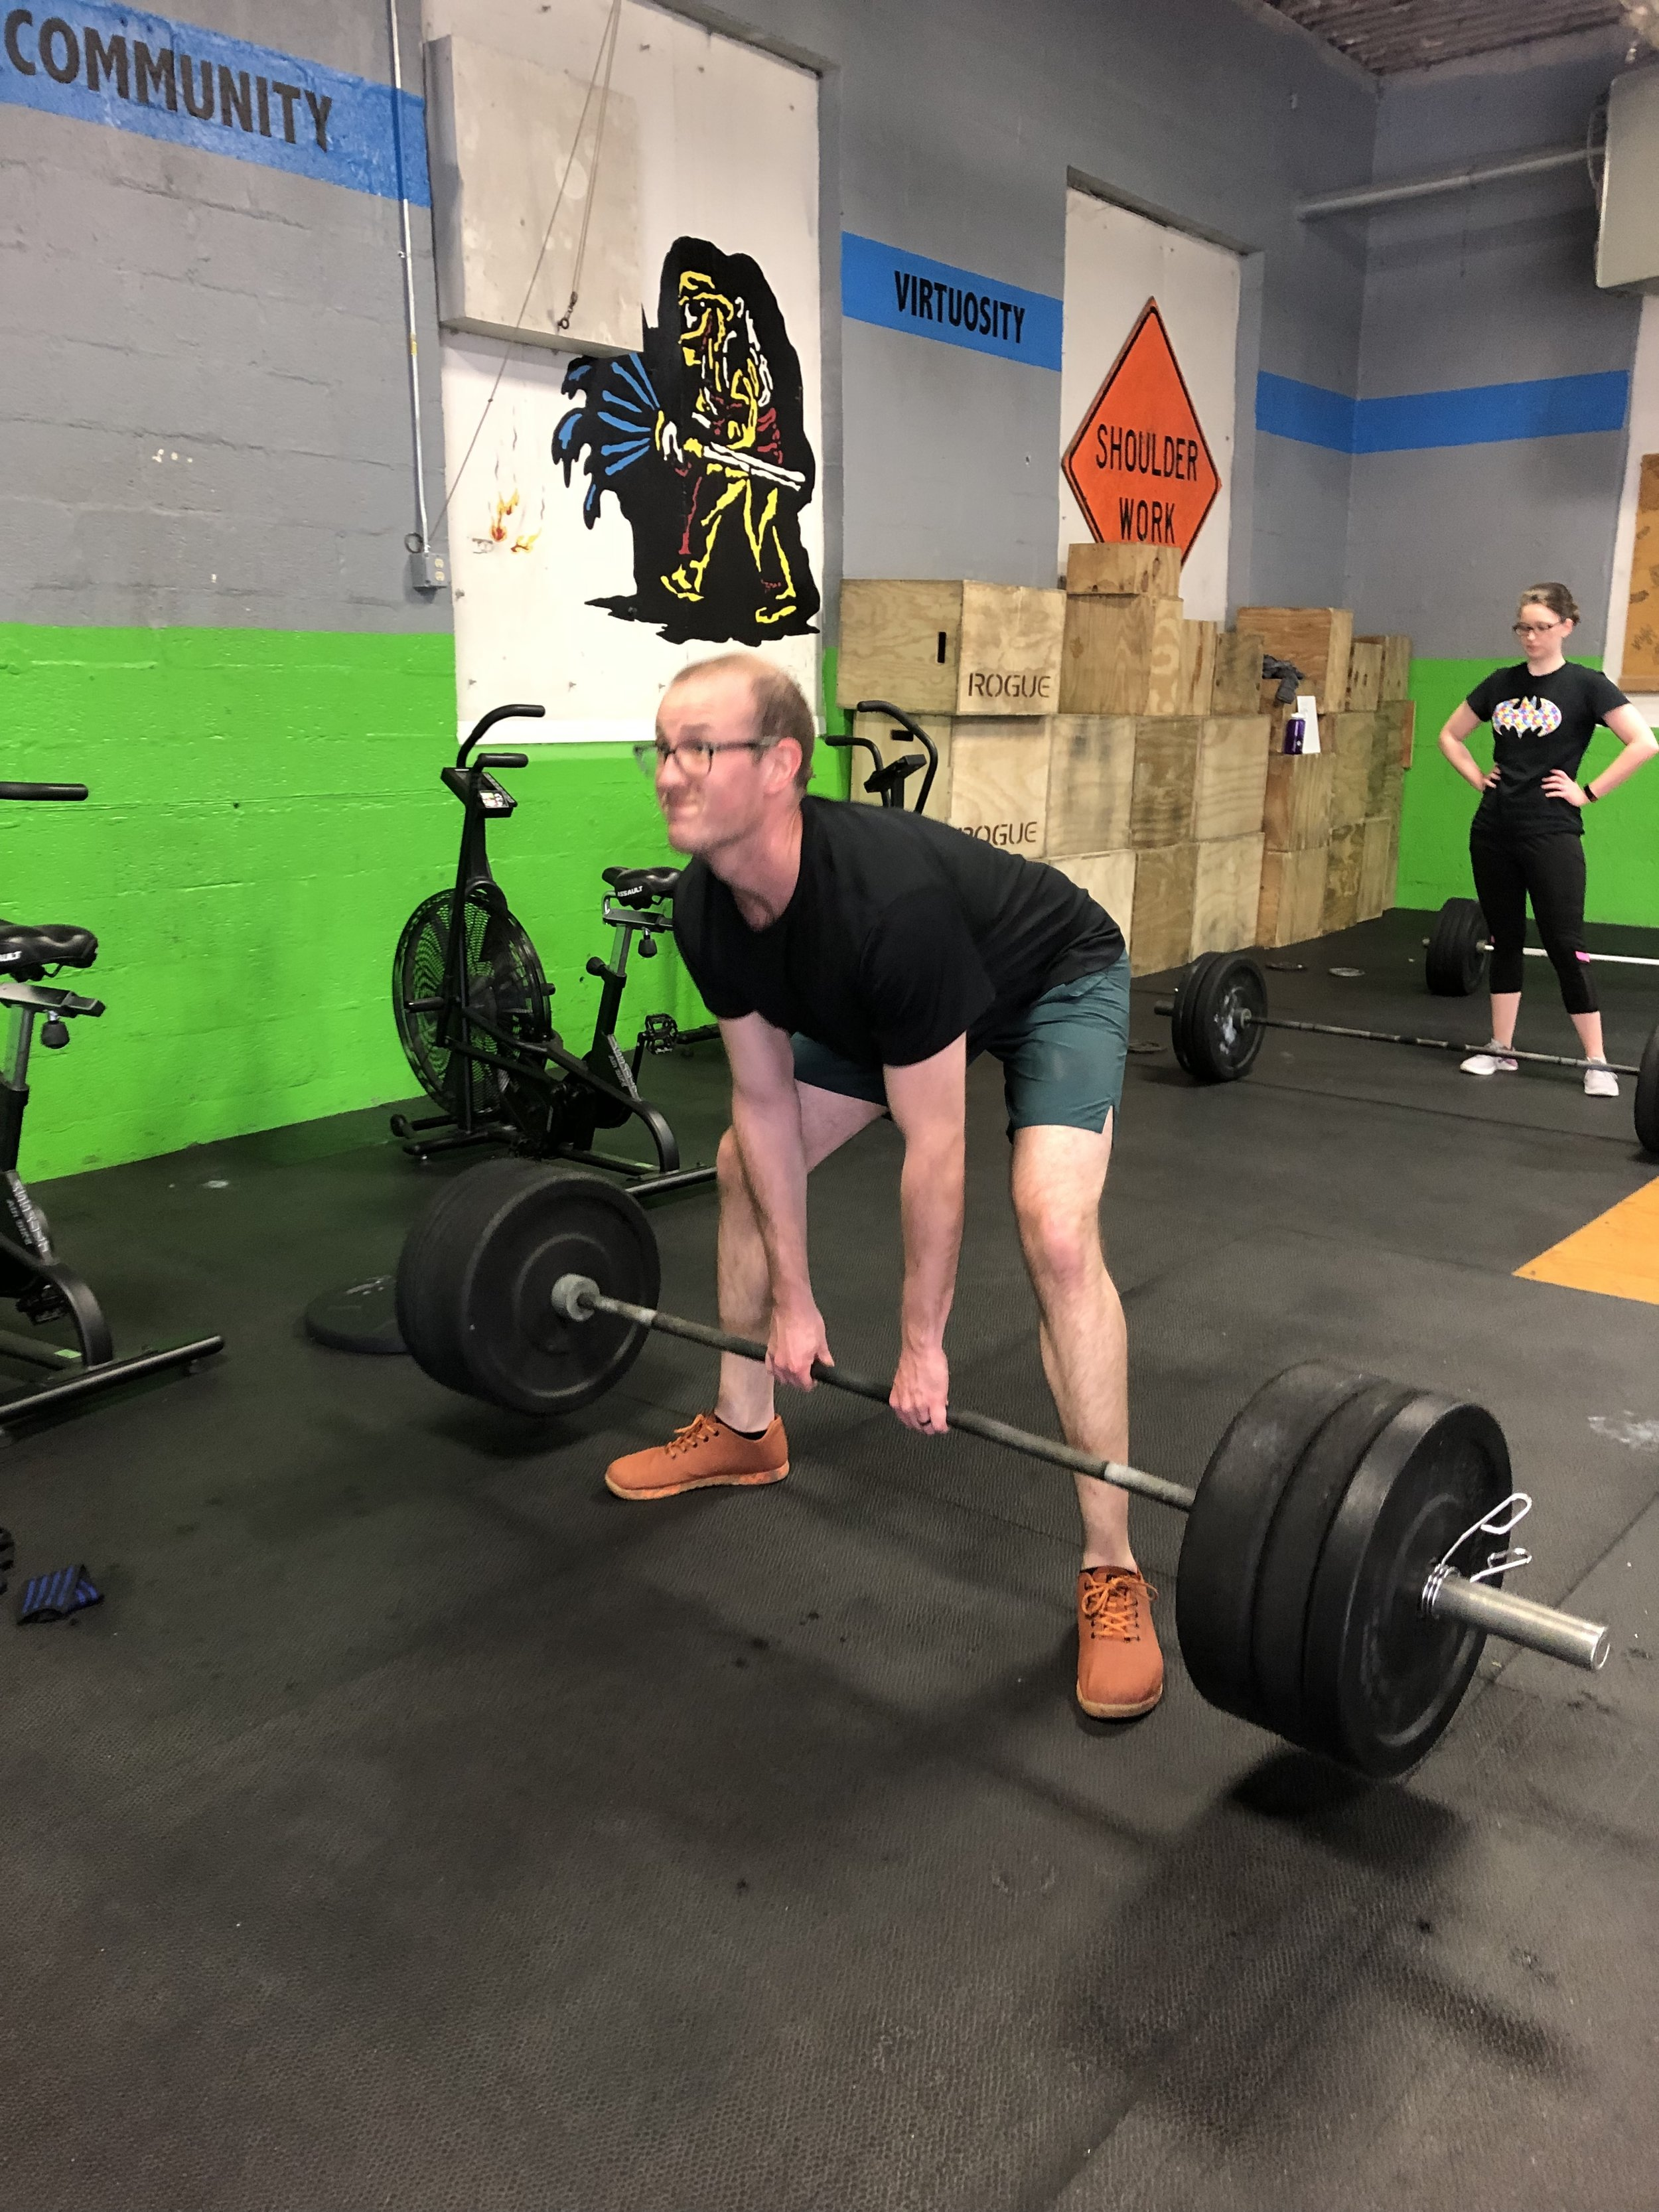 Bring Friend Day at 8:30!    Mod: Bench Press    Wod: TM 3   20:00 AMRAP  athlete 1 - row 300m  Athlete 2&3 work through Amrap  10 Tire Flips  20 DB Hang Cleans (35/50)  30 DB alternating lunges (35/50)  40 Wallballs (14/20)